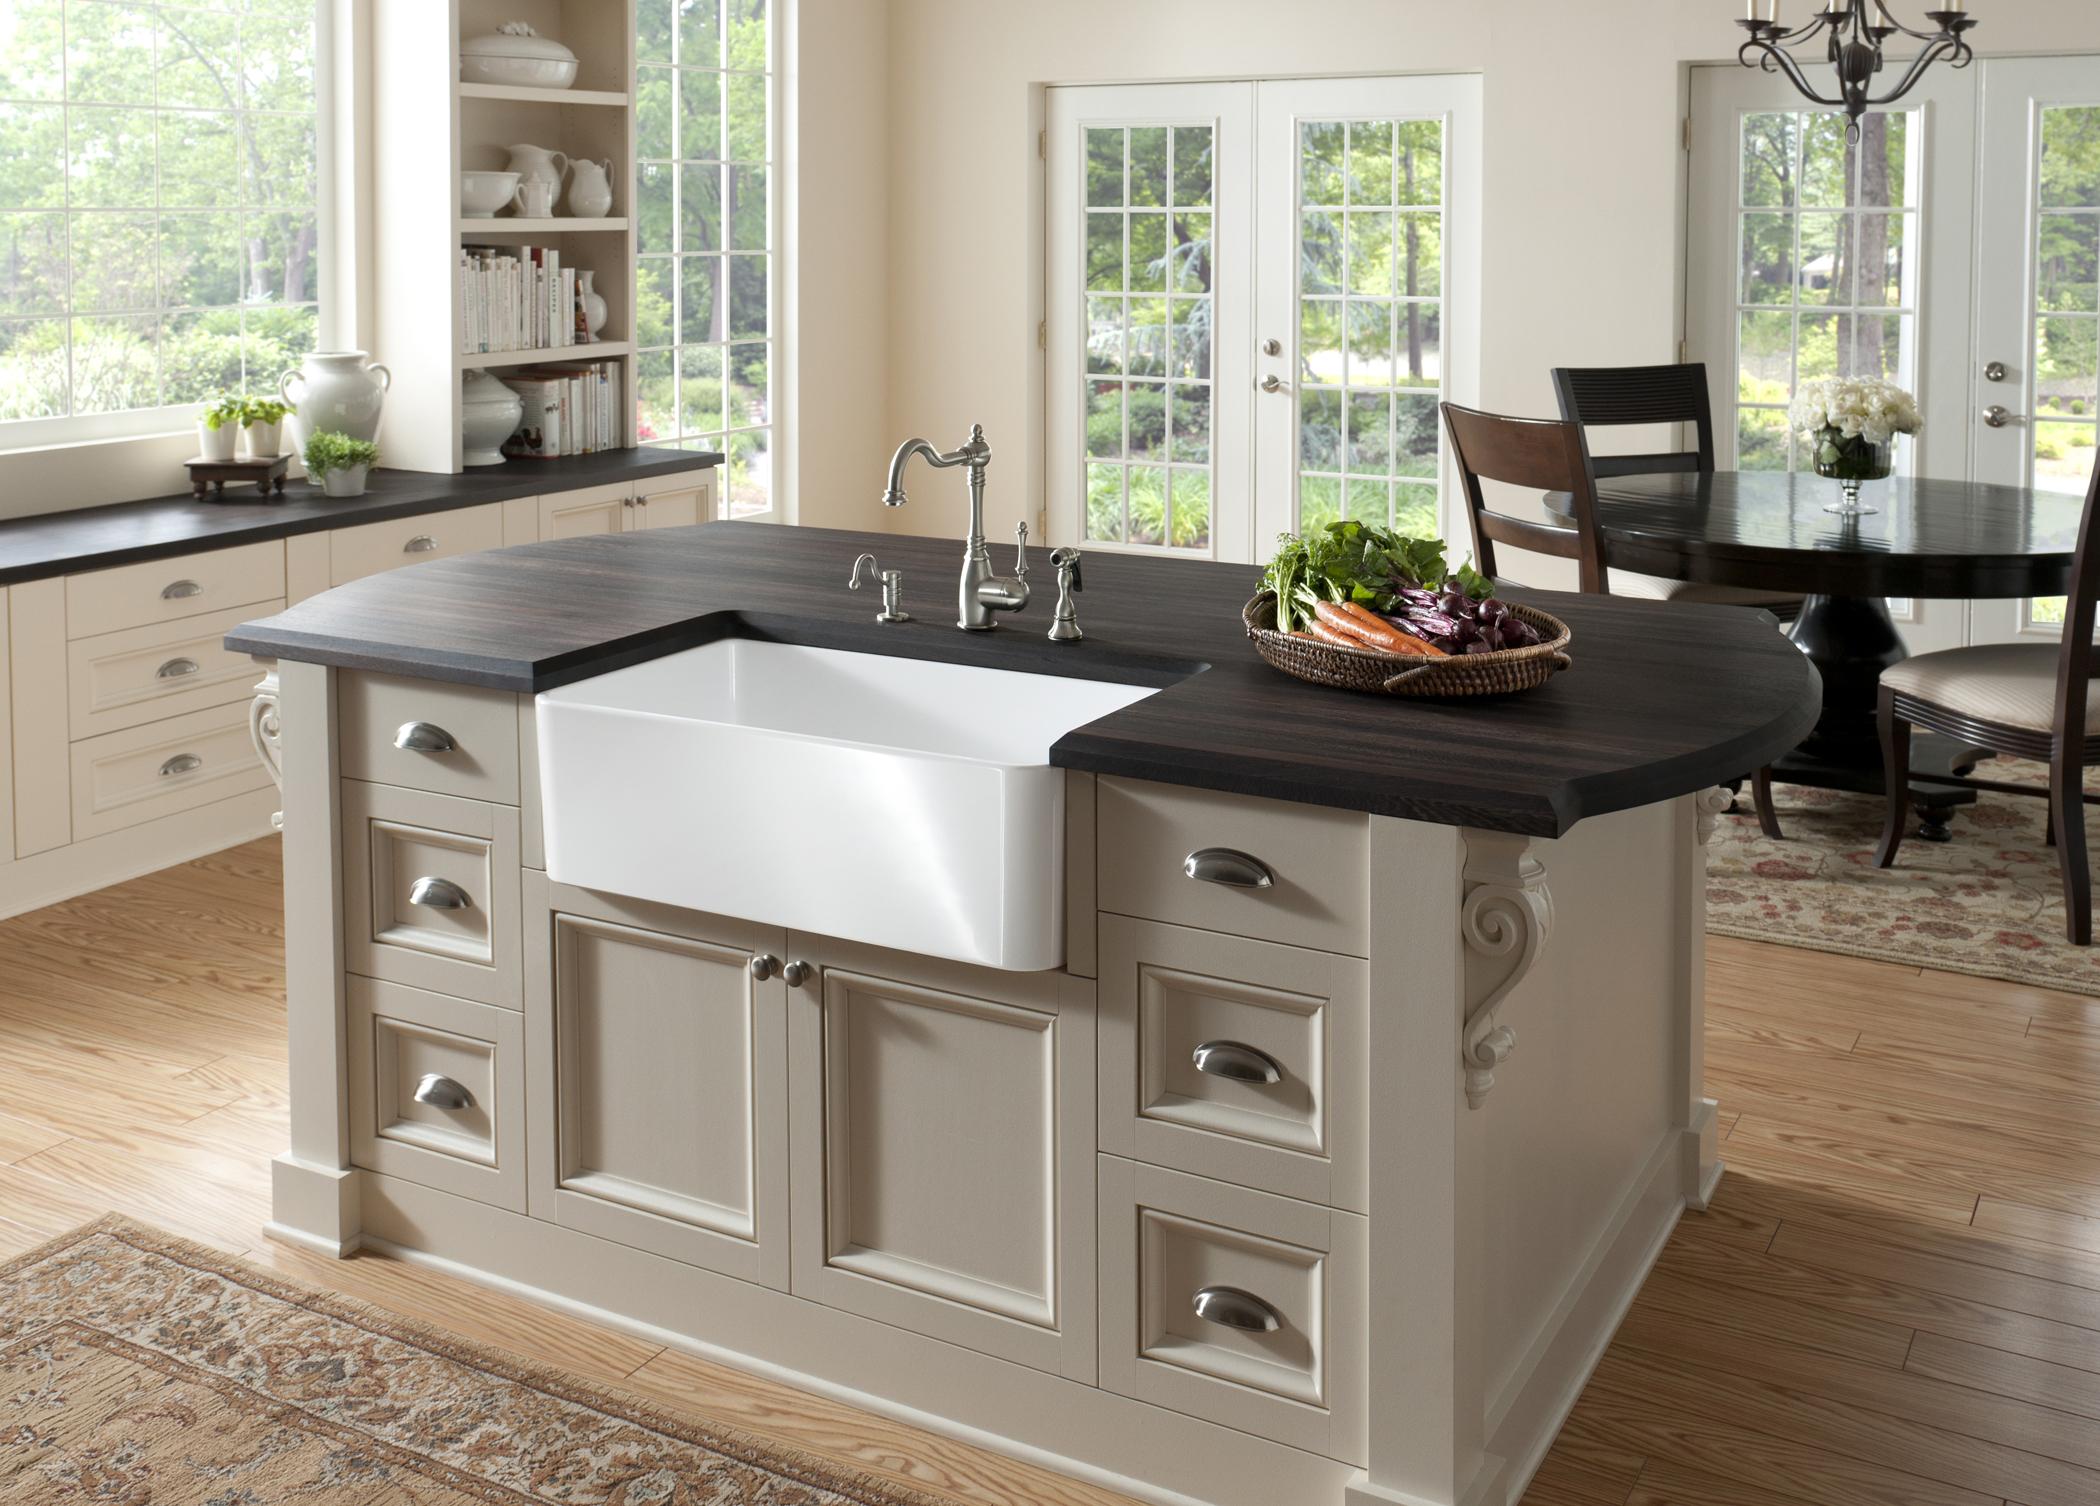 prweb blanco kitchen sinks BLANCO CERANA Image 3